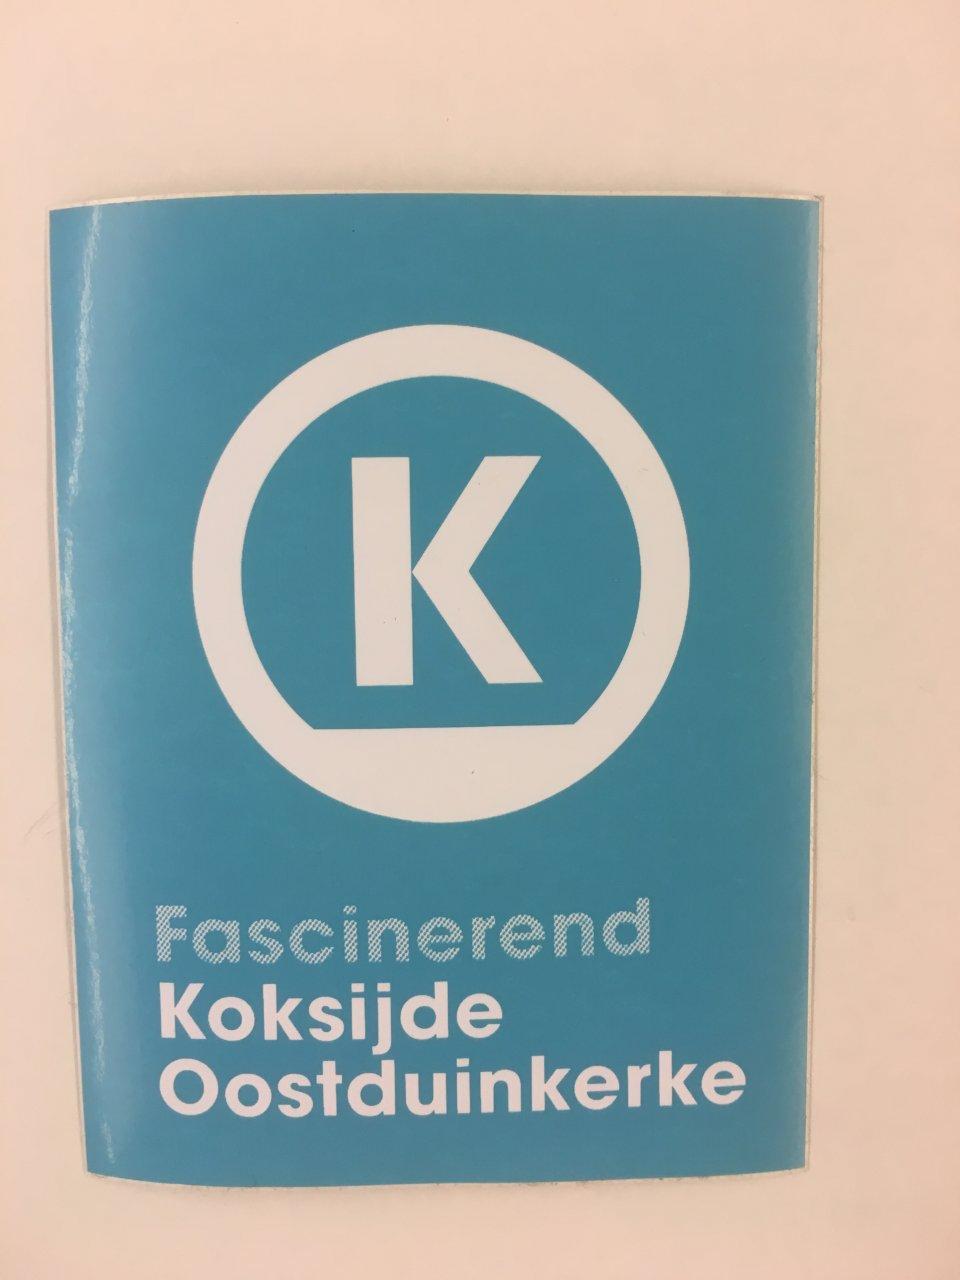 sticker Koksijde